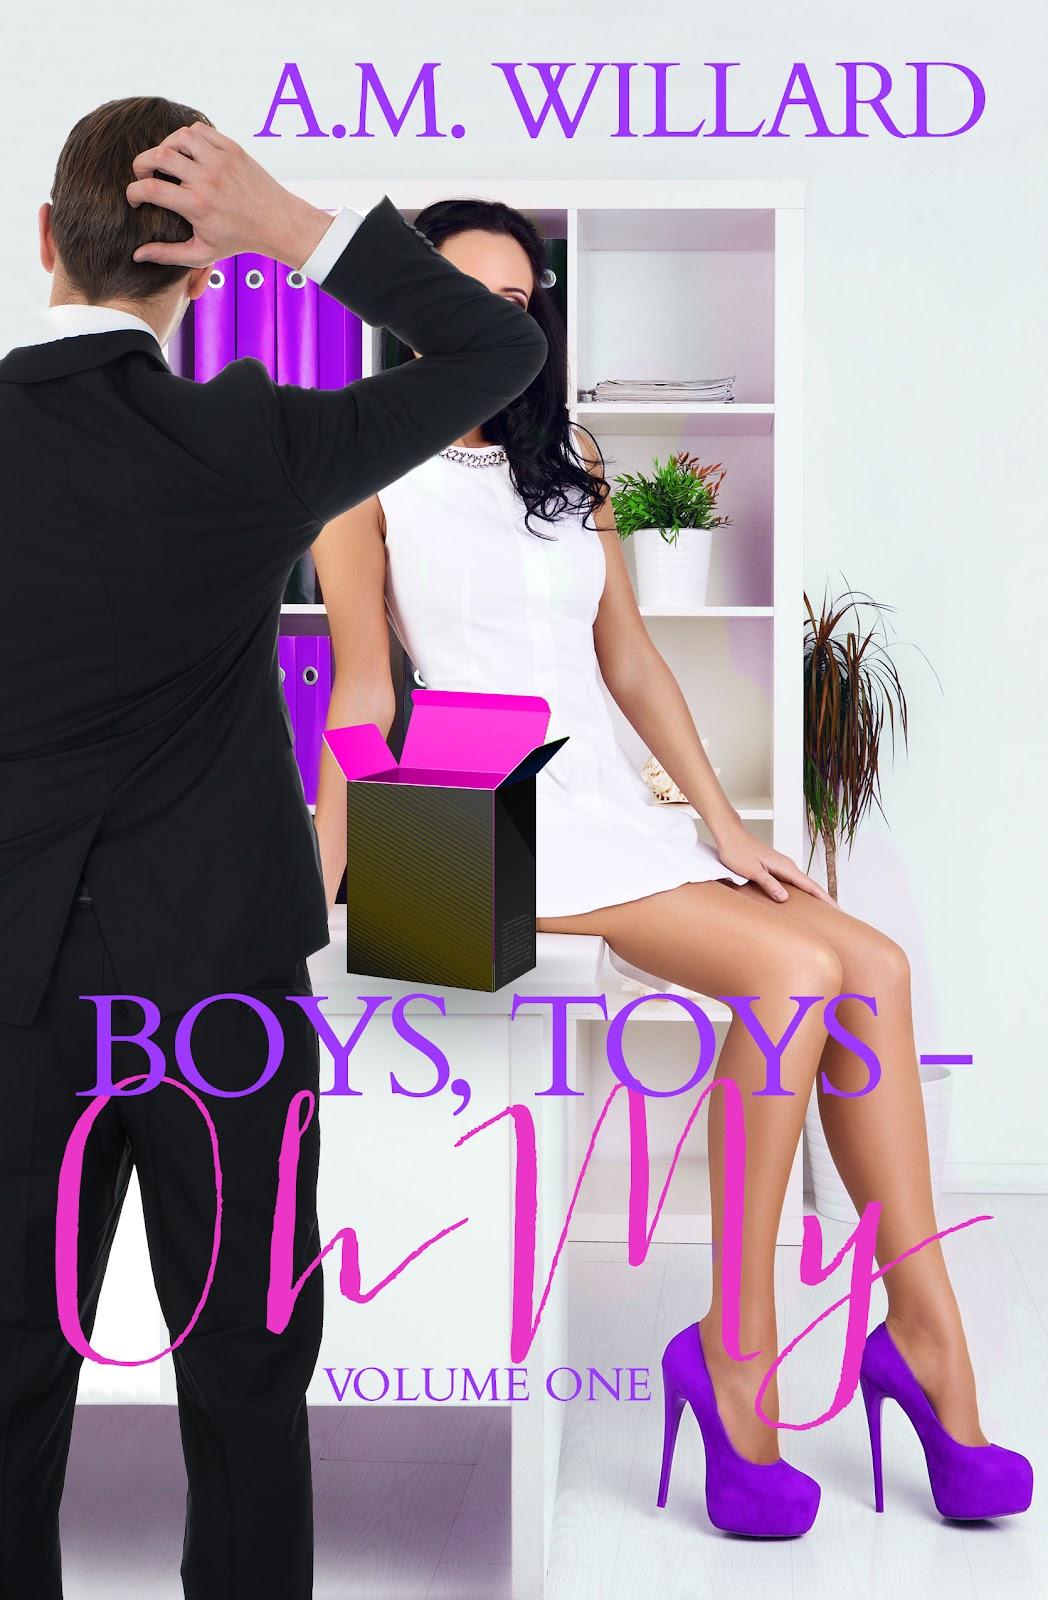 Boys,Toys-OhMy cover.jpg